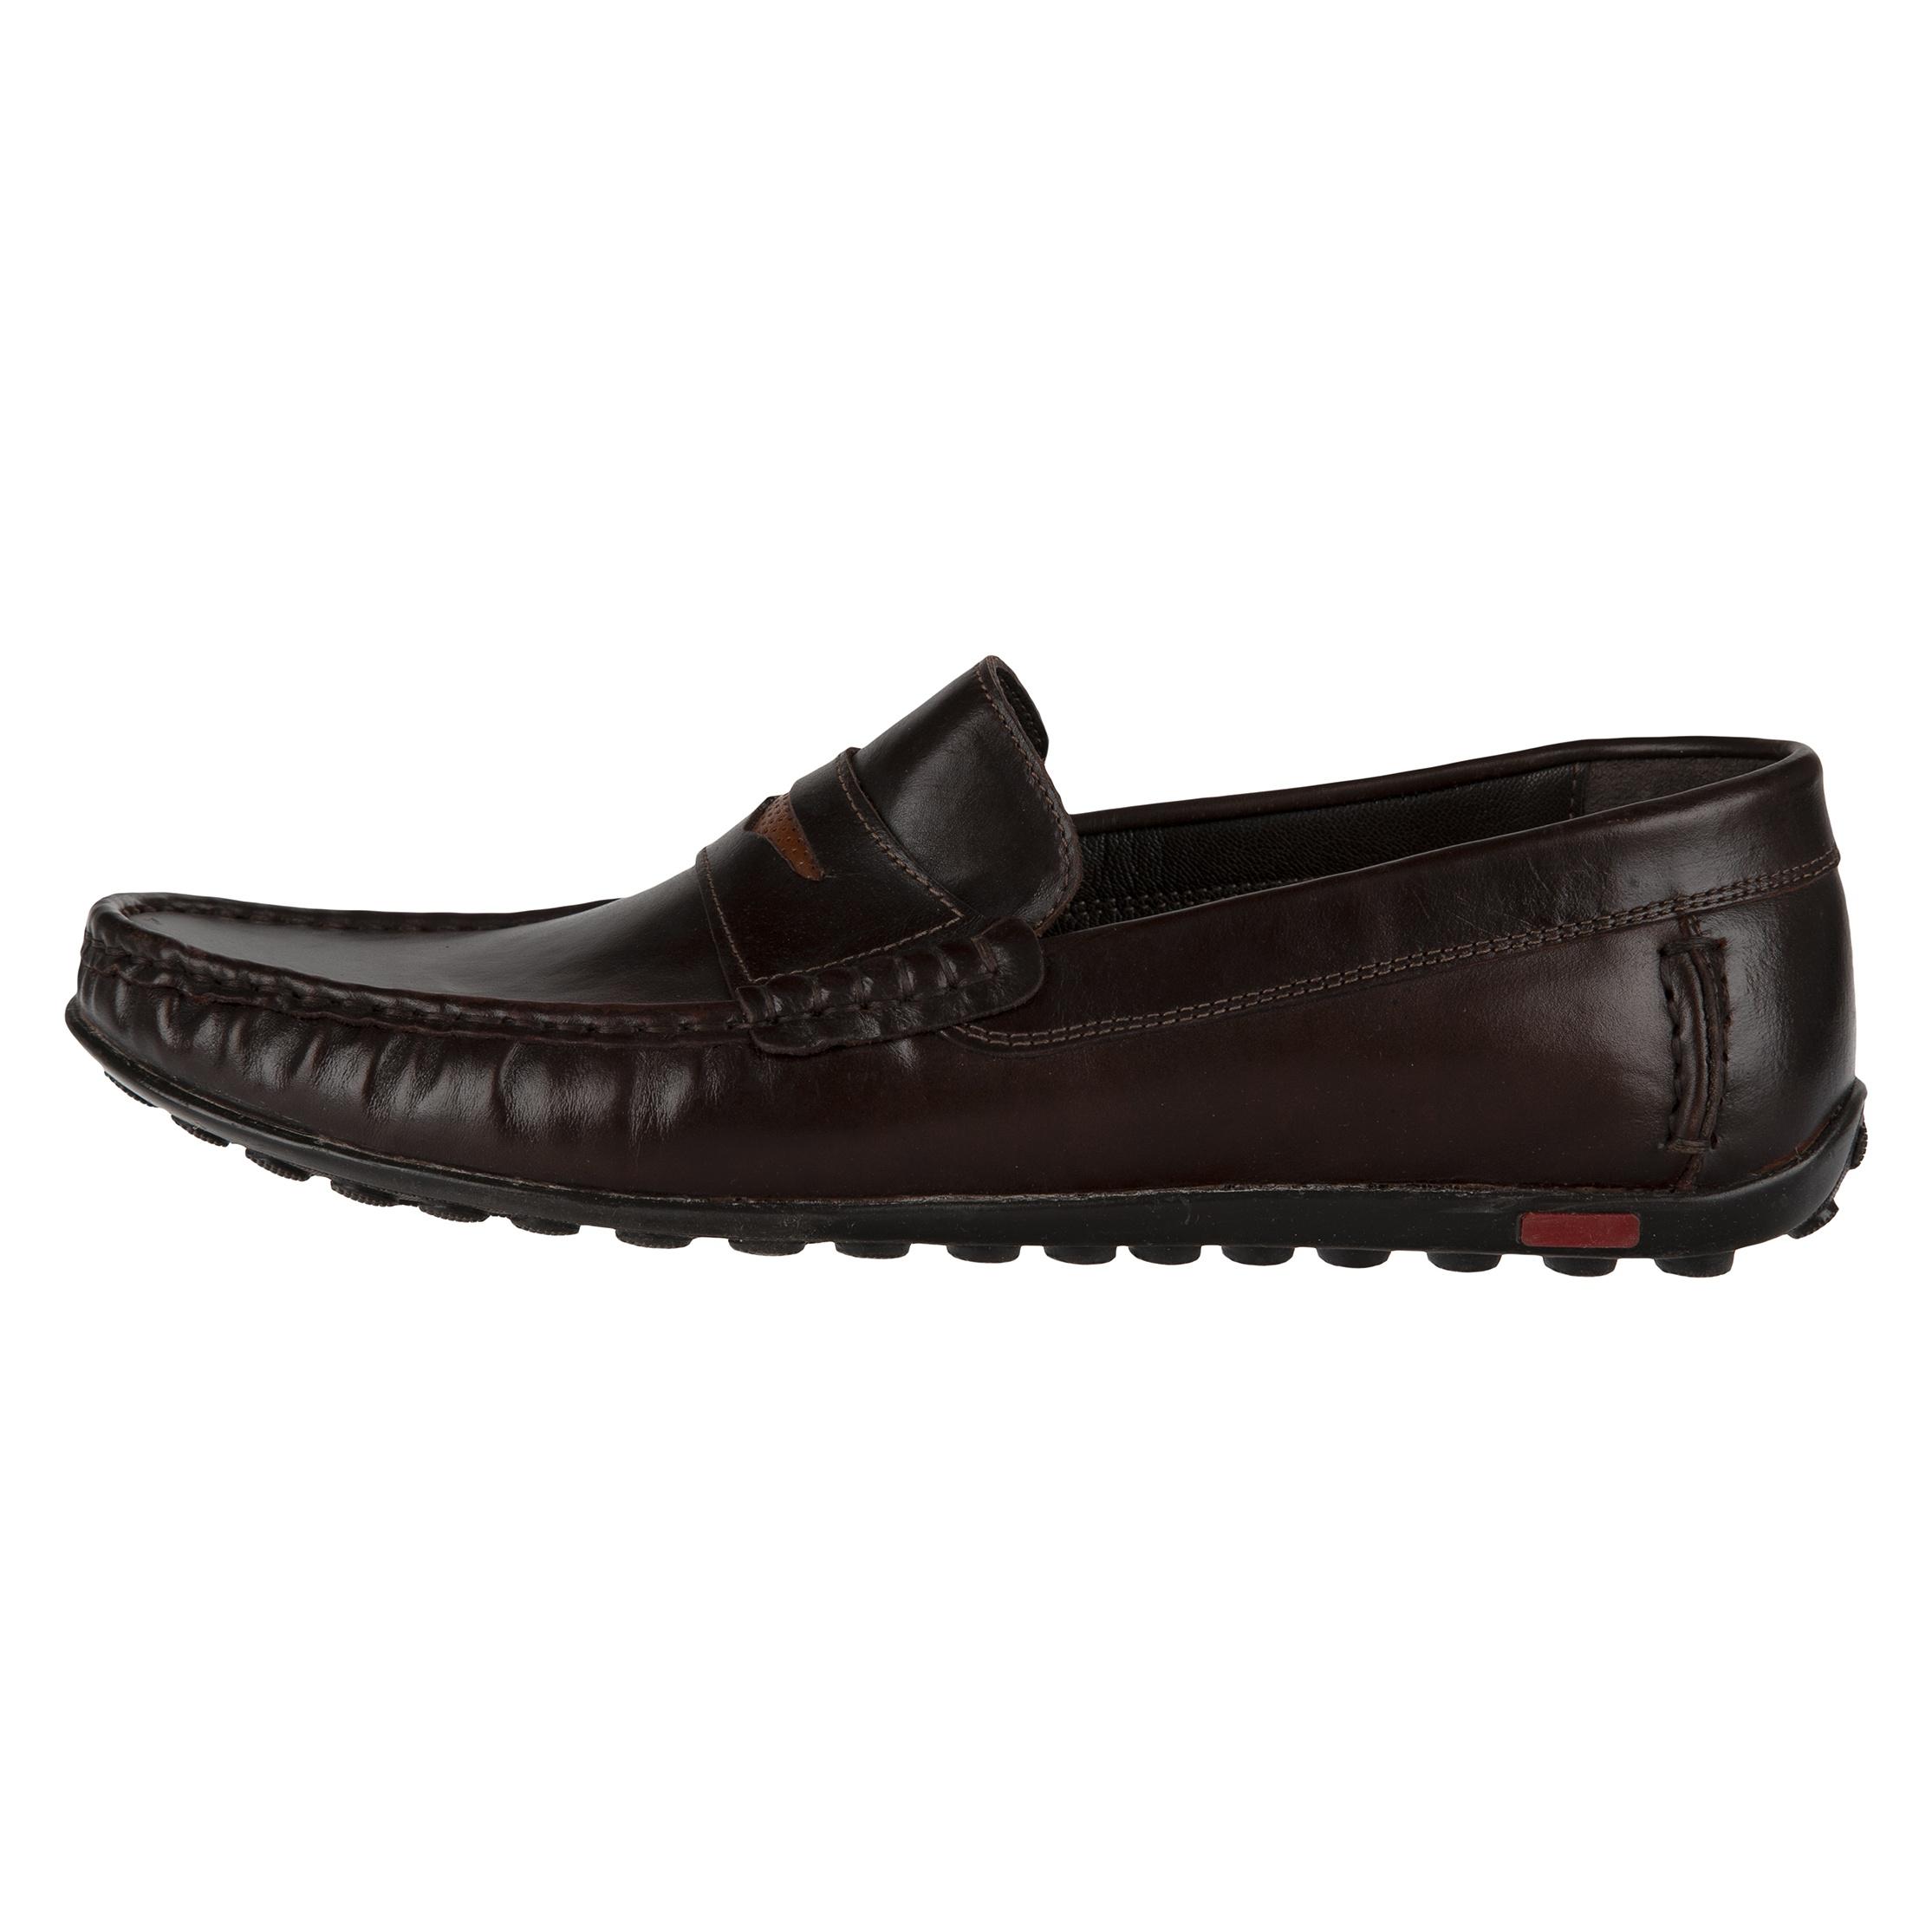 کفش روزمره مردانه ریمکس مدل RS7126B-104